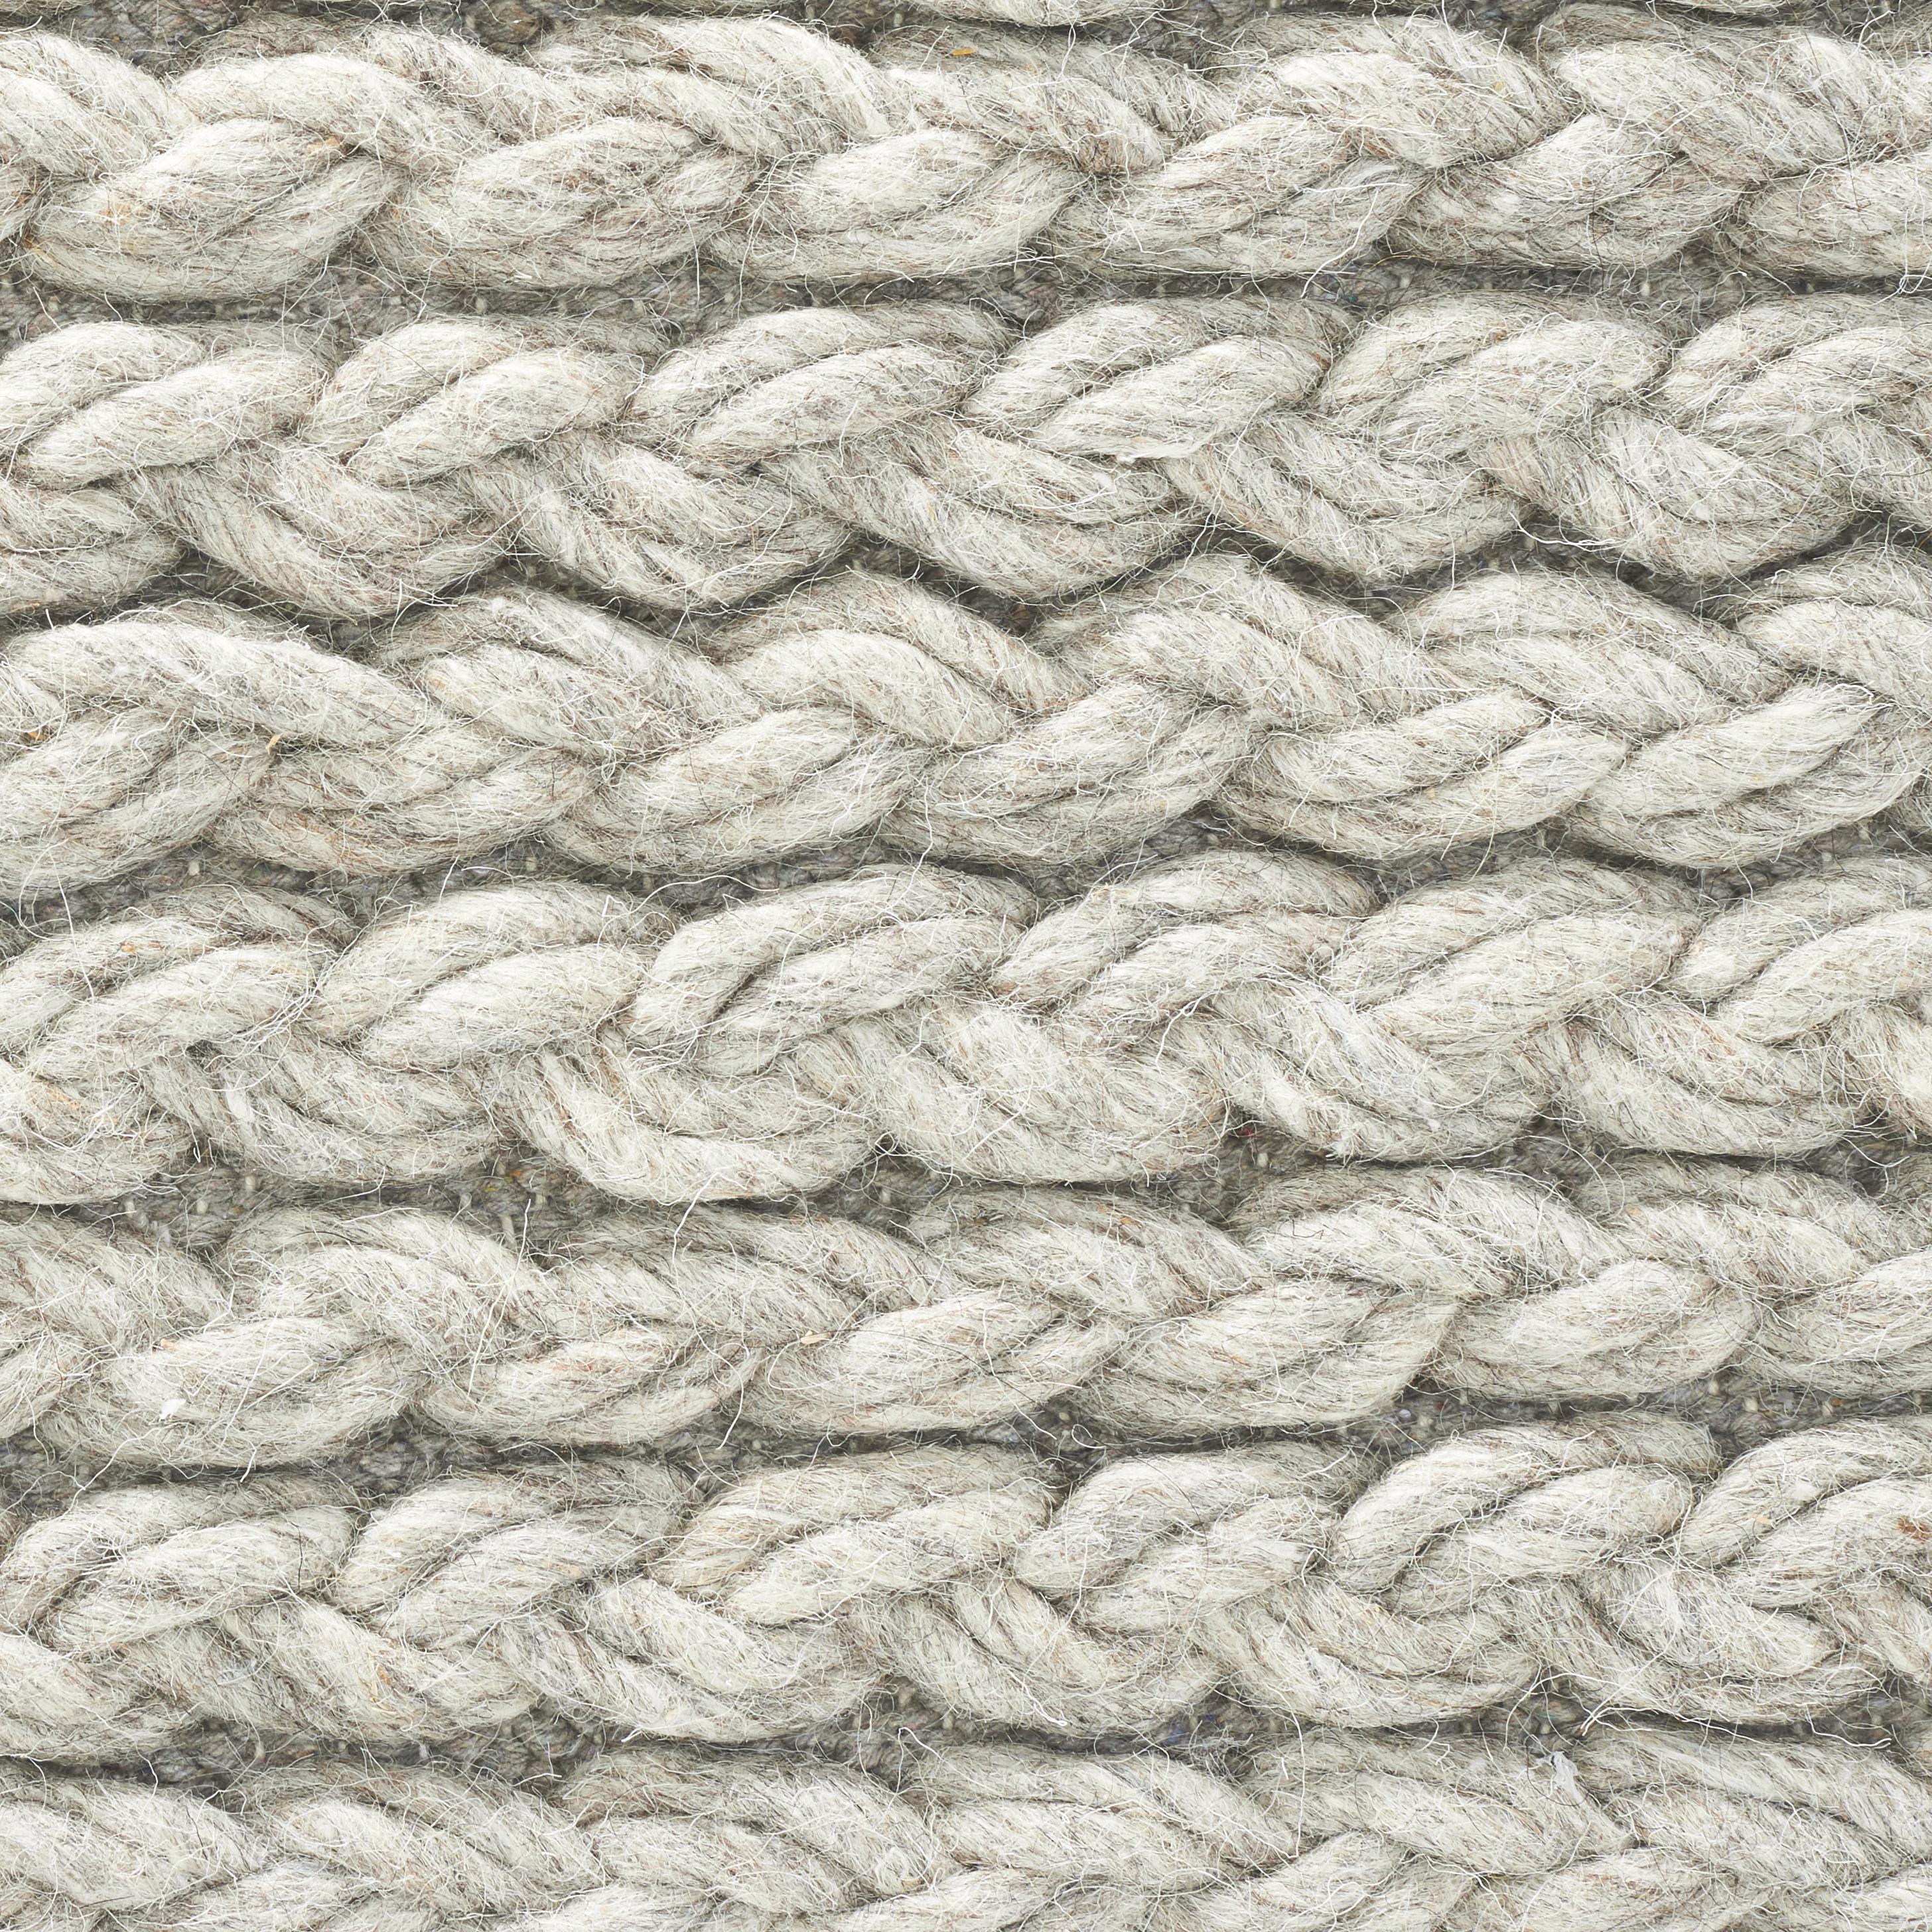 Handwebteppich Kordula 80x150 cm - Grau, MODERN, Textil (80/150cm) - PREMIUM LIVING